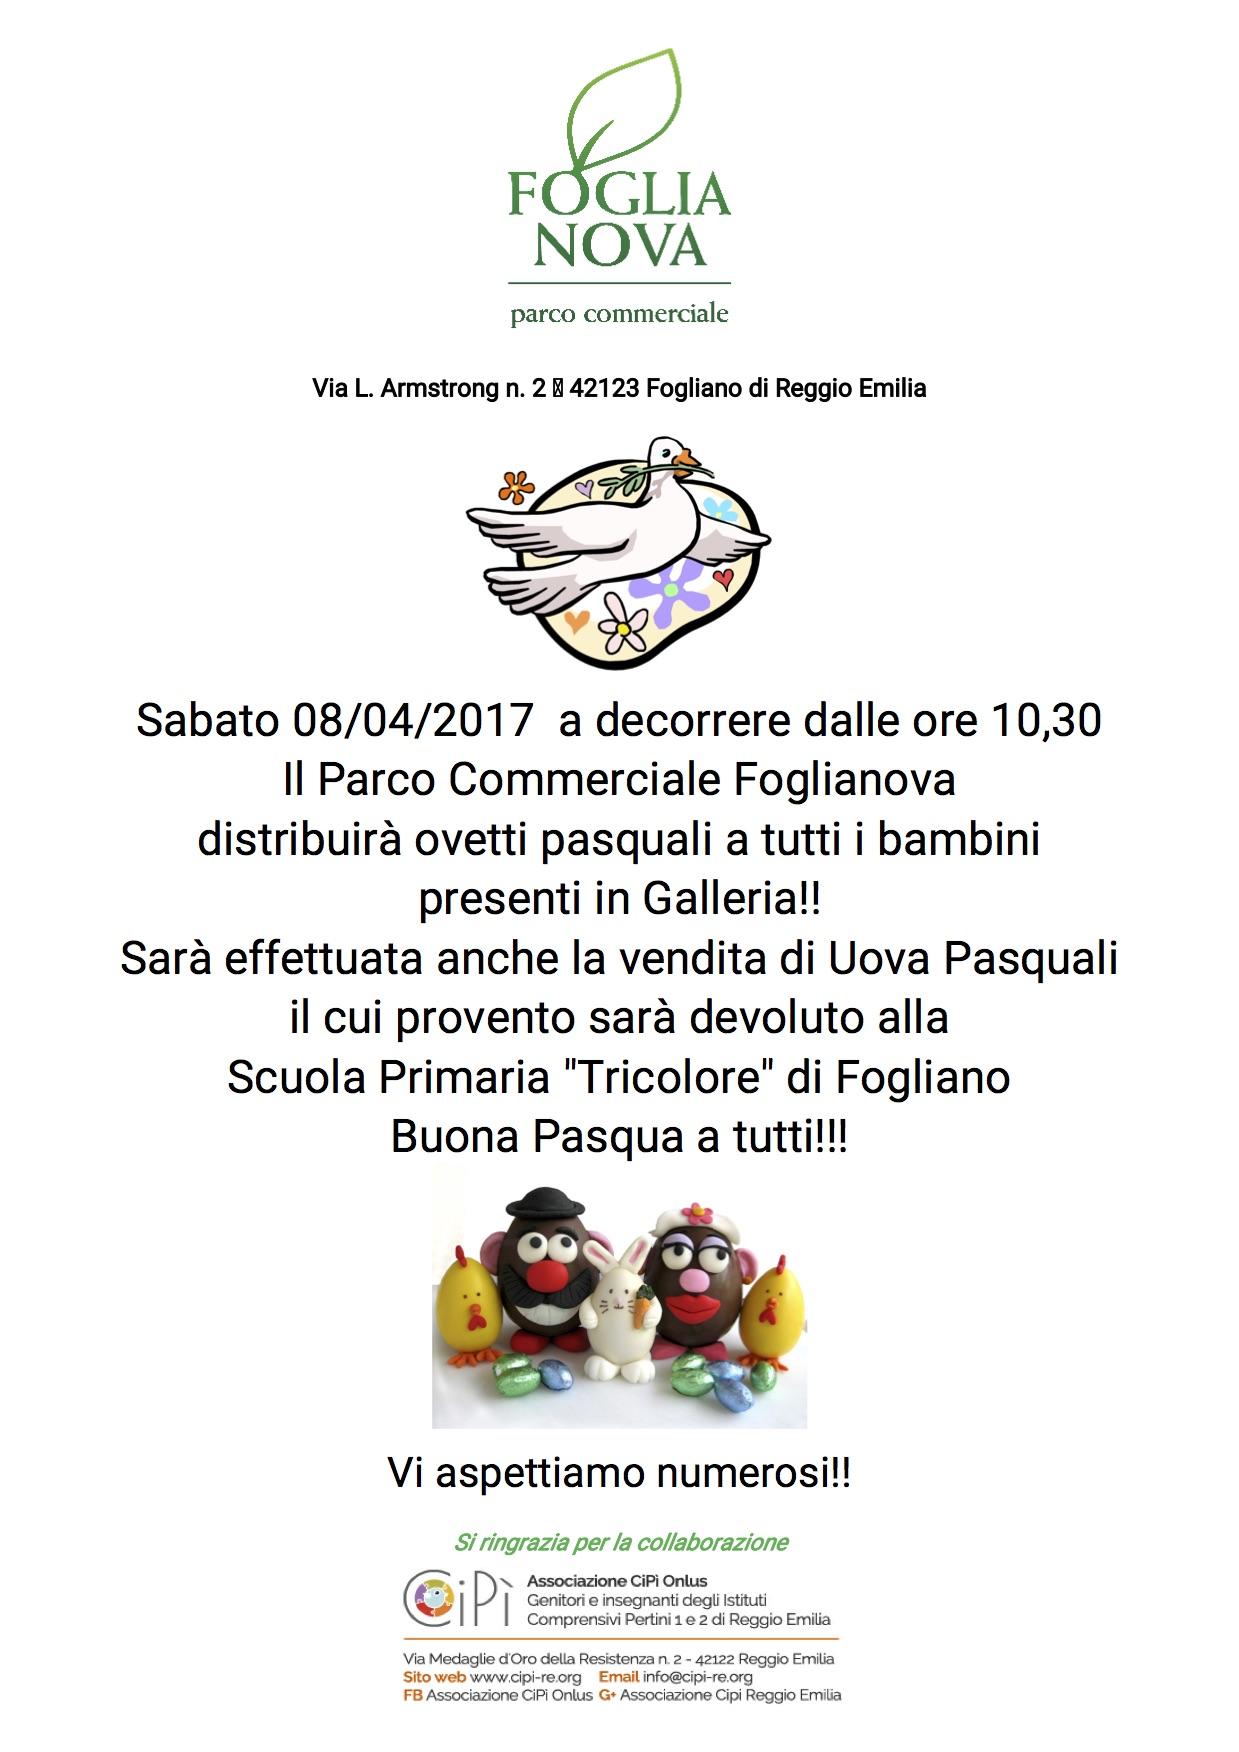 2017-04 - Vendita uova Fogliano